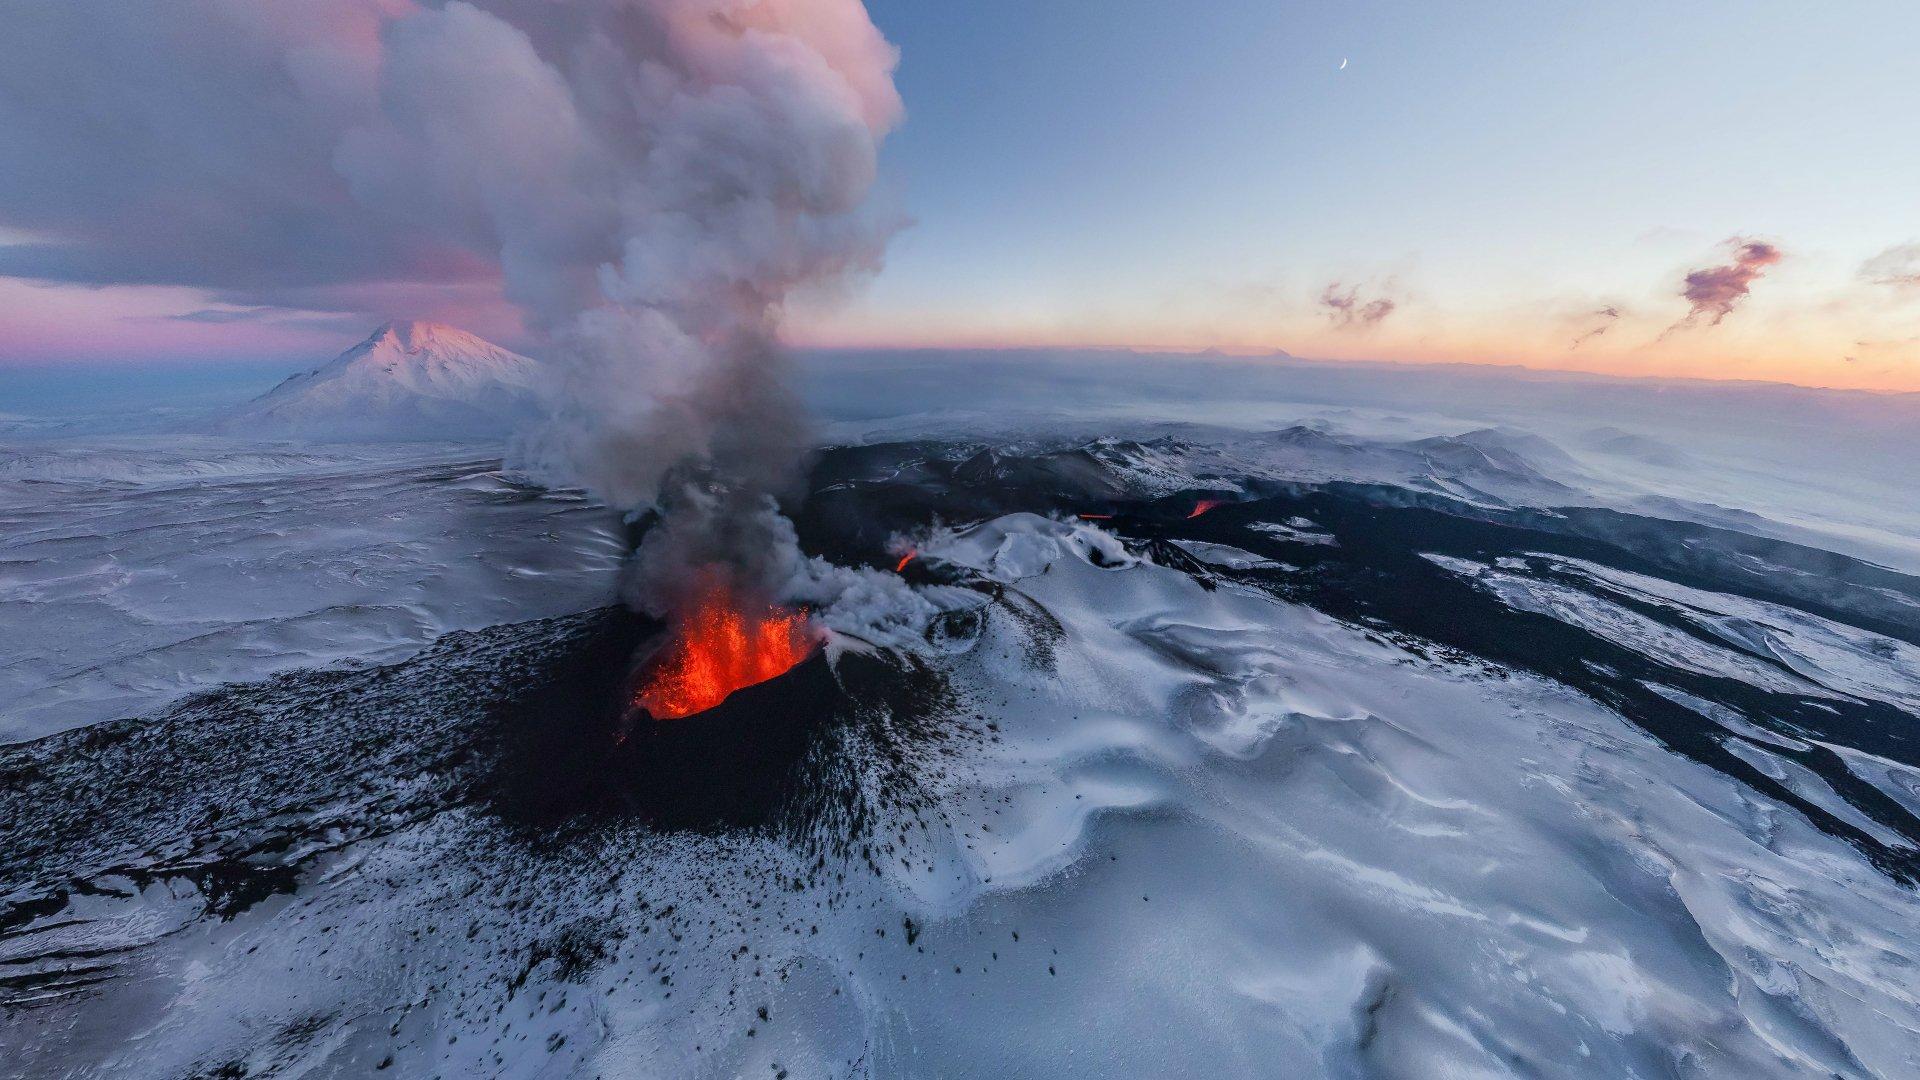 Volcano Wallpapers Hd: Volcano Under The Ice HD Wallpaper